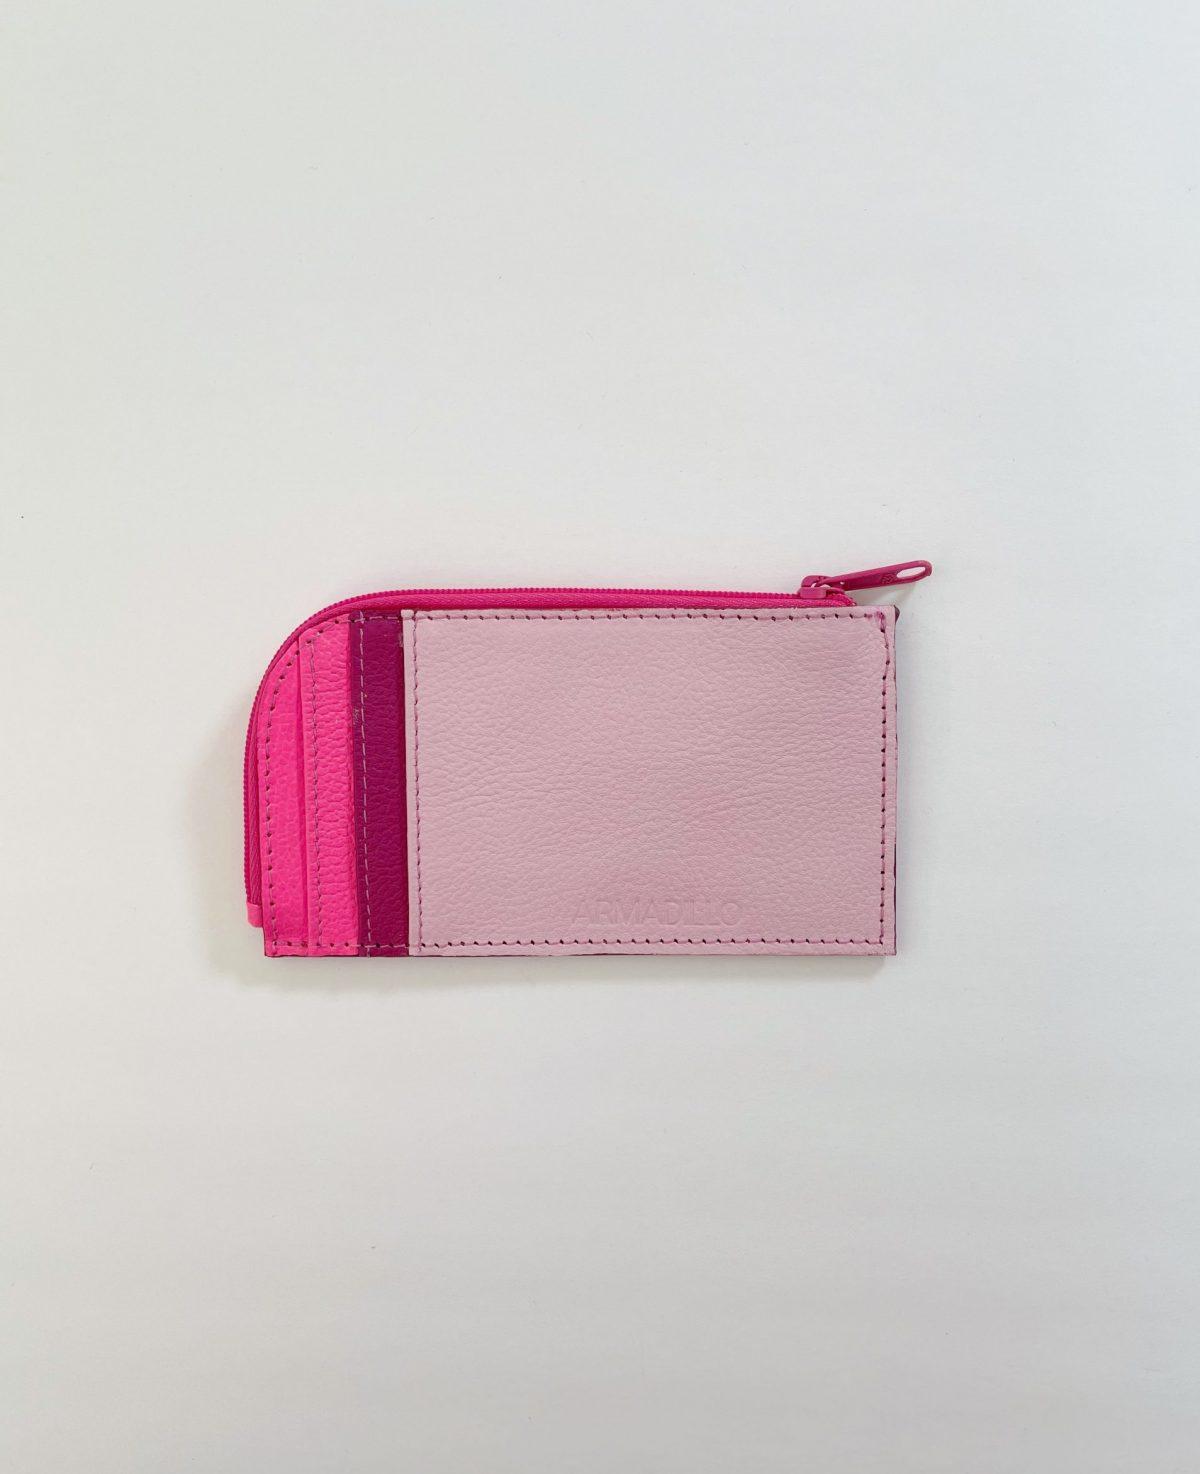 Zip_Card_holder_women_accessories_pink_fuchsia_02